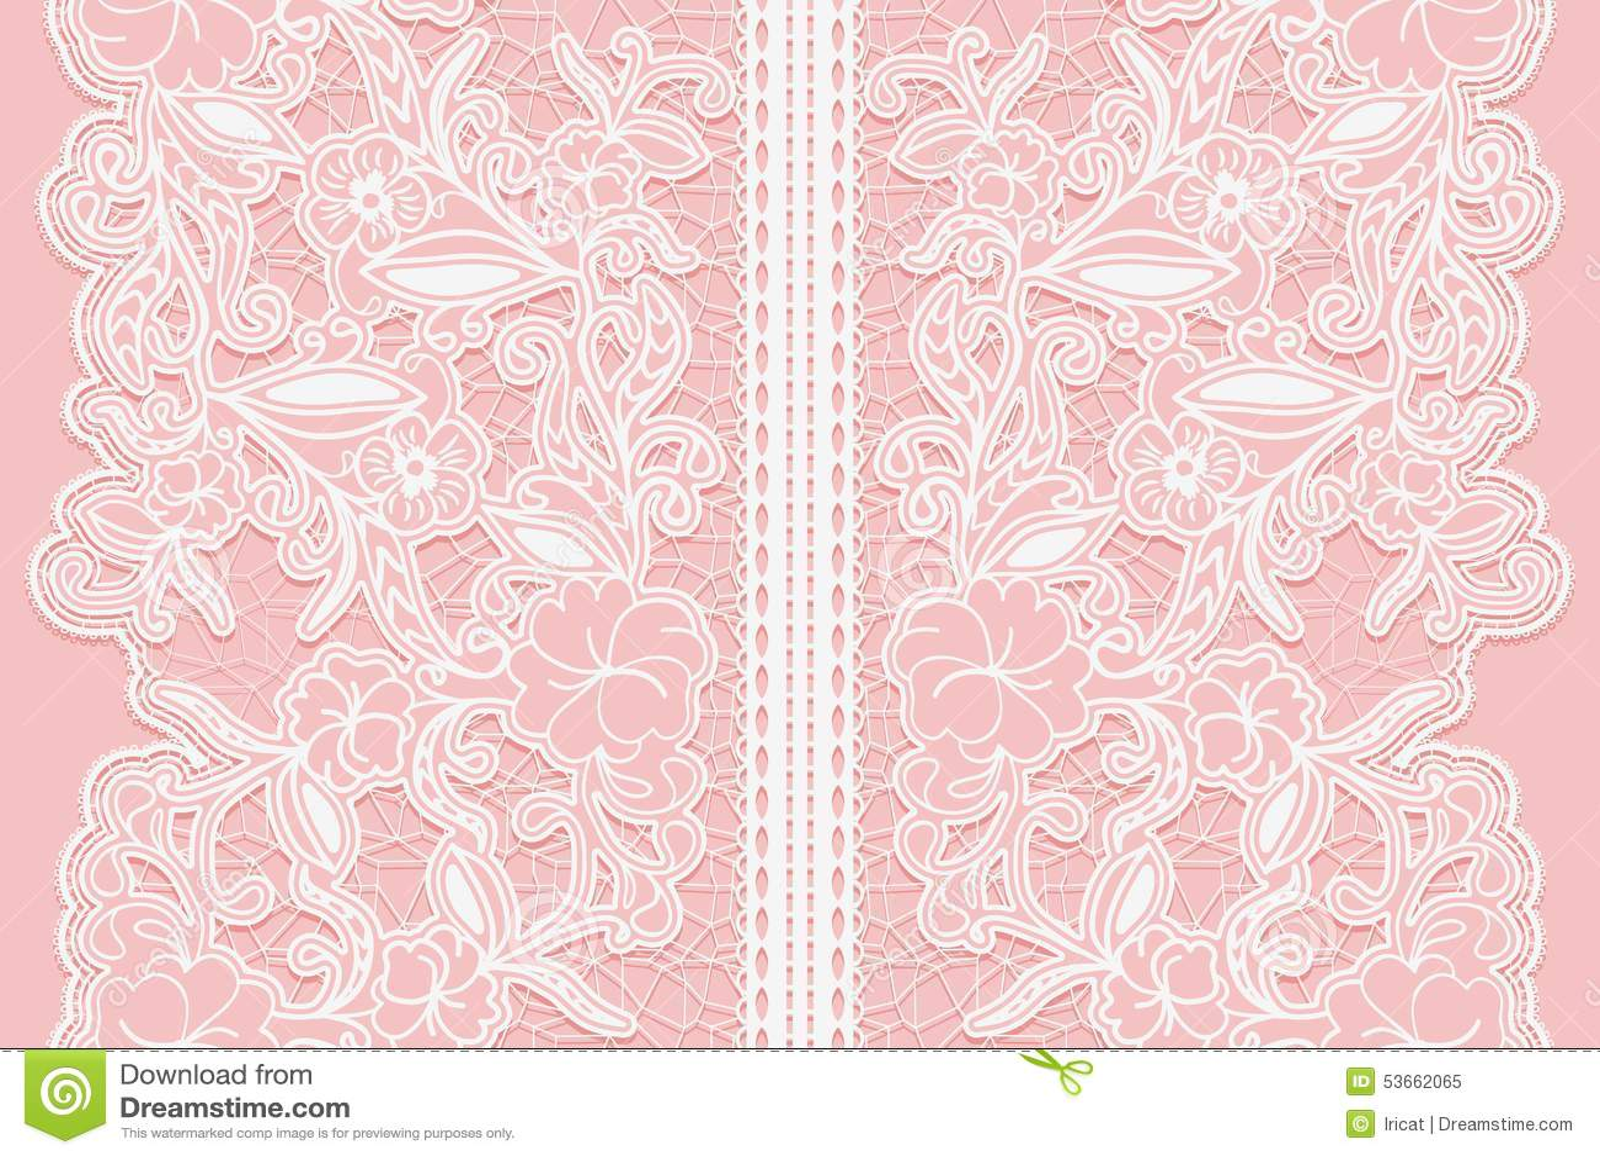 Wallpaper Vectors Photos and PSD files  Free Download